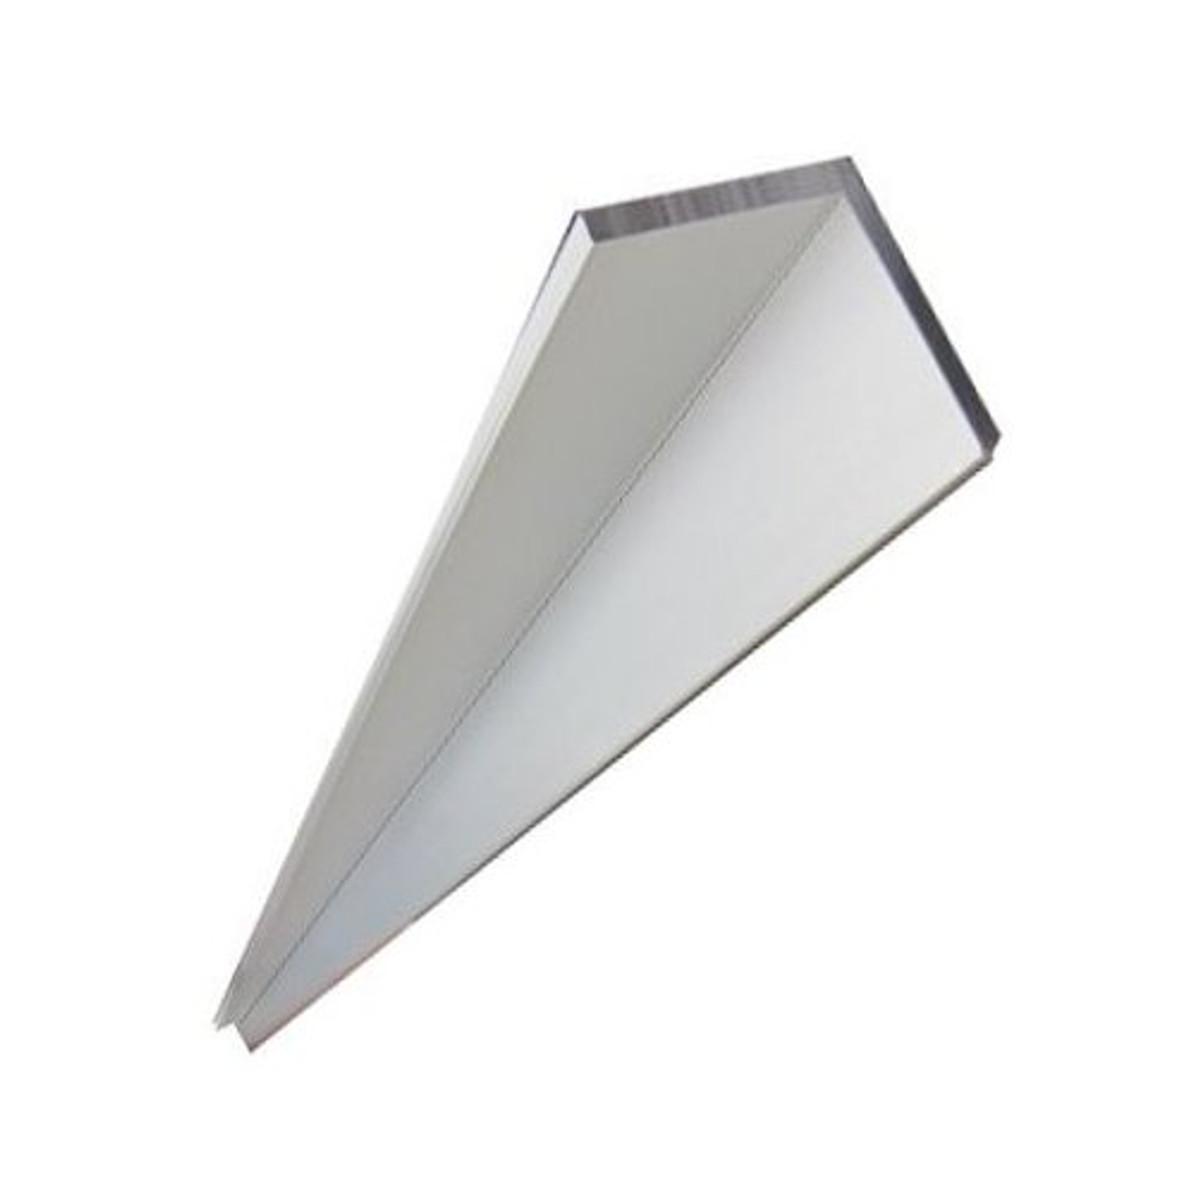 "Aluminum Angle 6061 T6 1/"" x 1/"" x 1//8/"" wall x 36/"""